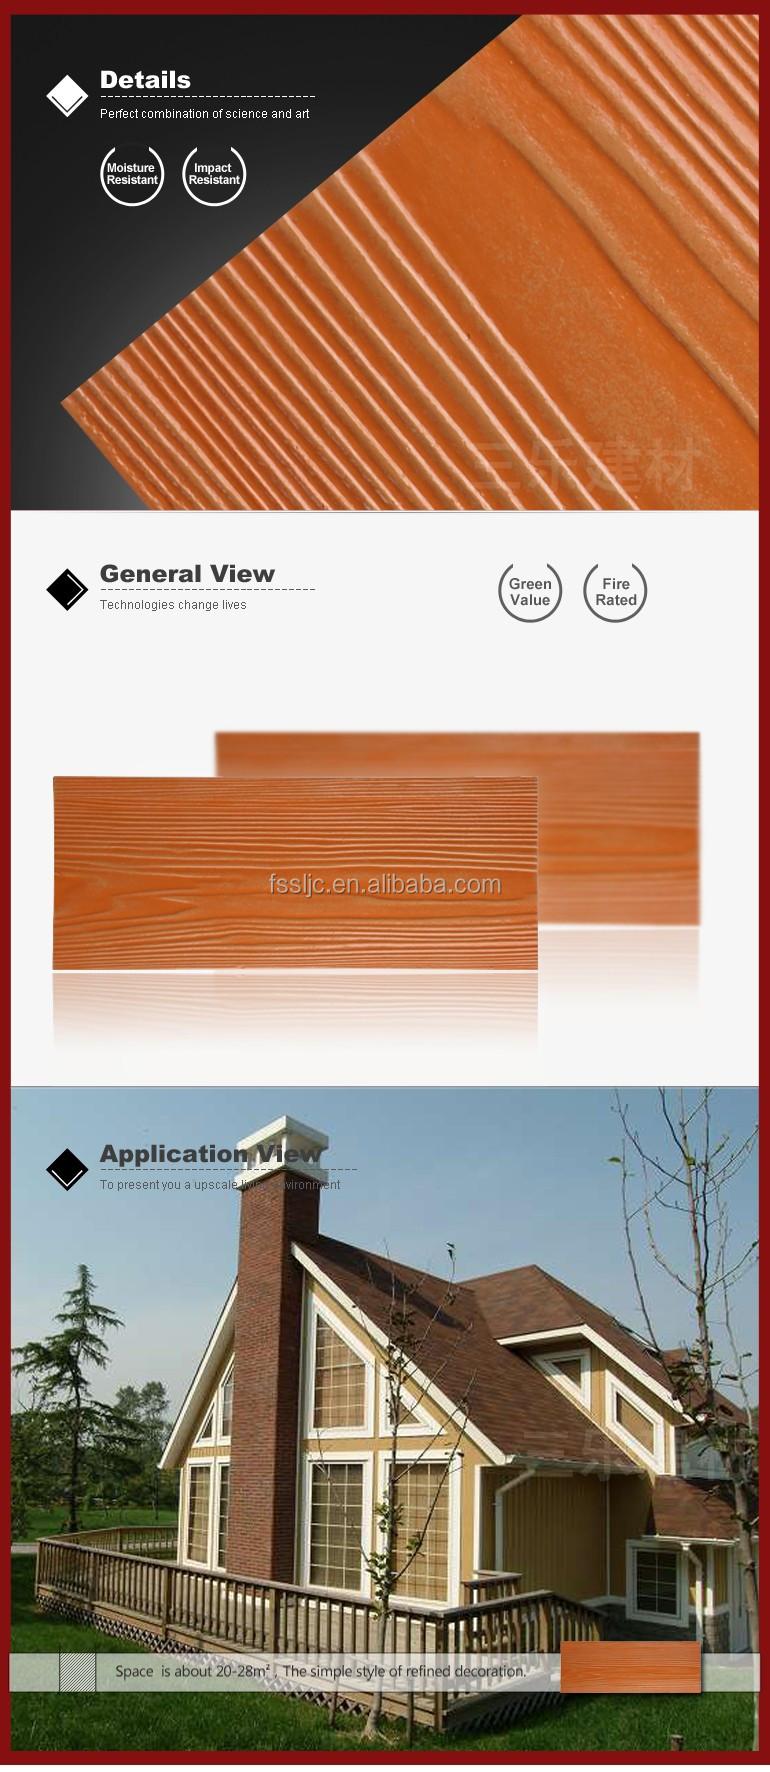 Inorganic Exterior Wall Siding Panels Wood Grain Fiber Cement Board